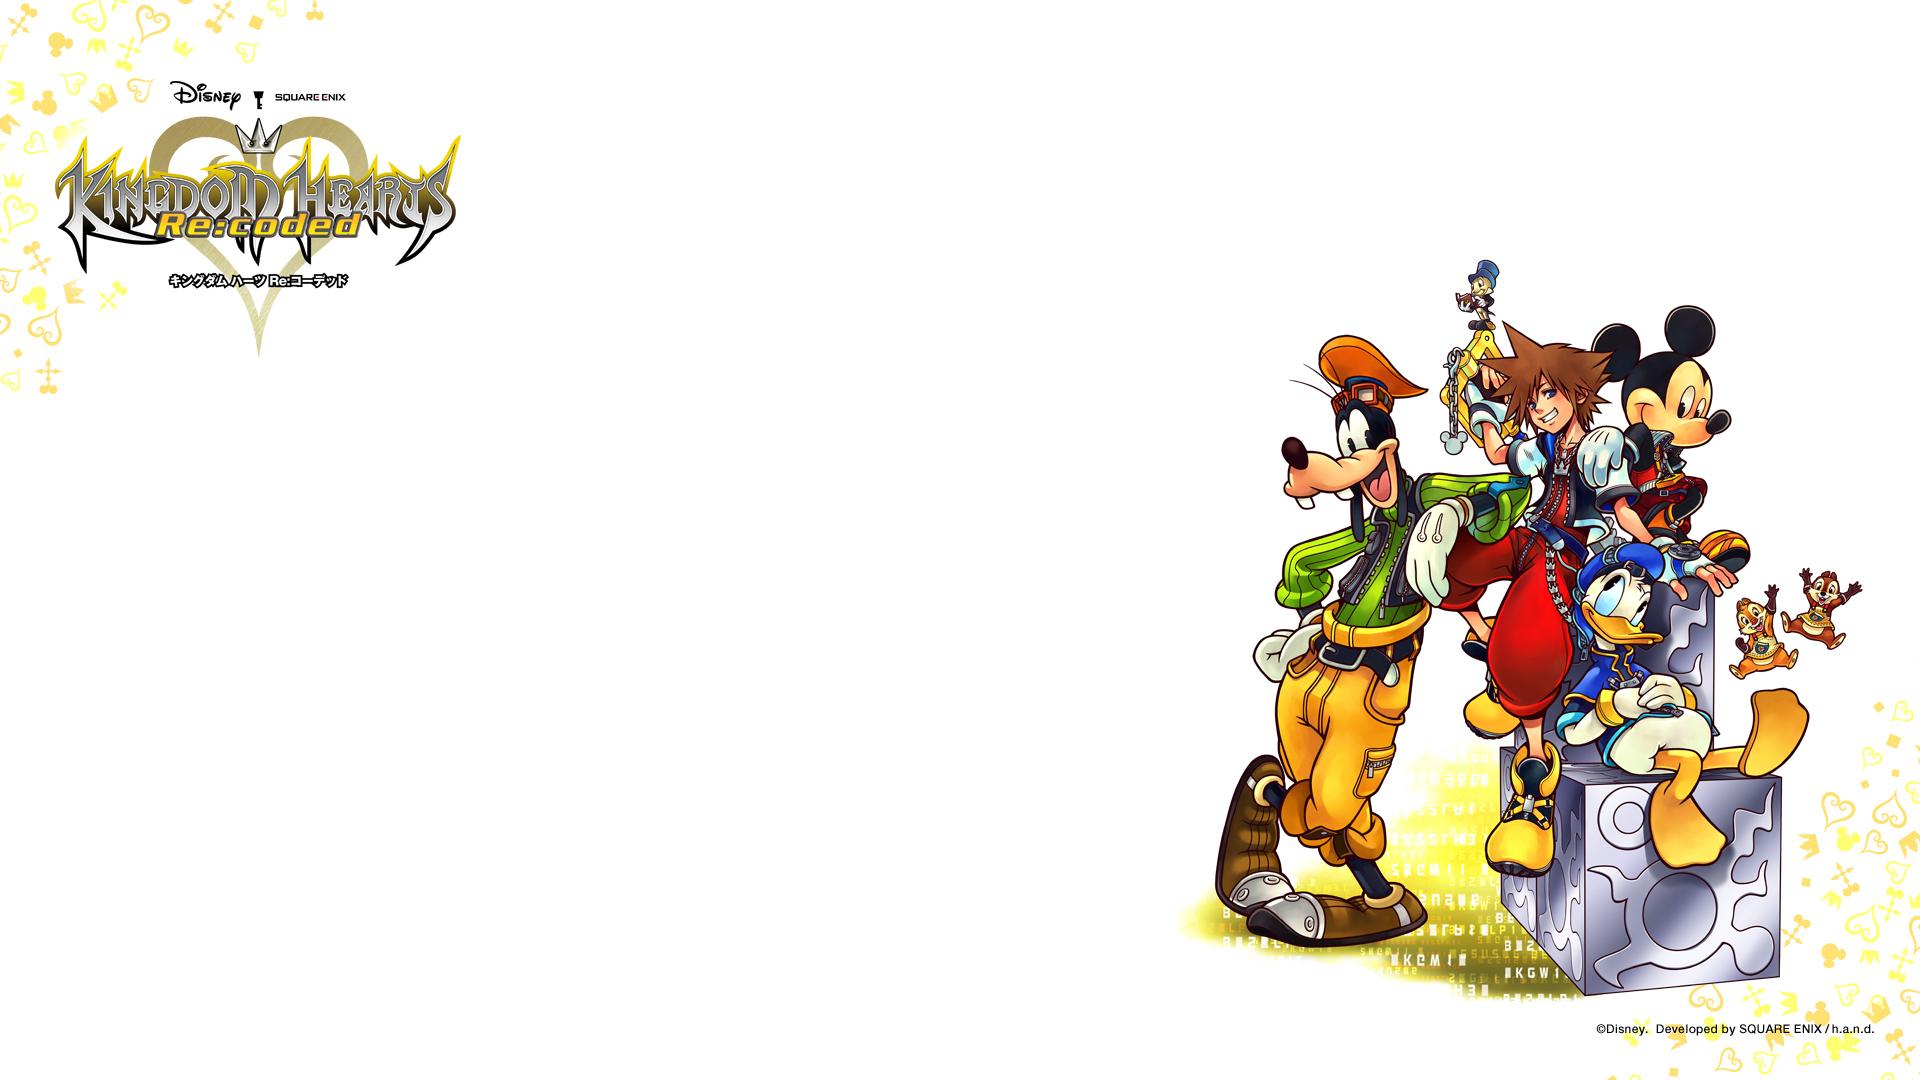 Free Download More Kingdom Hearts 2 Wallpapers Kingdom Hearts 2